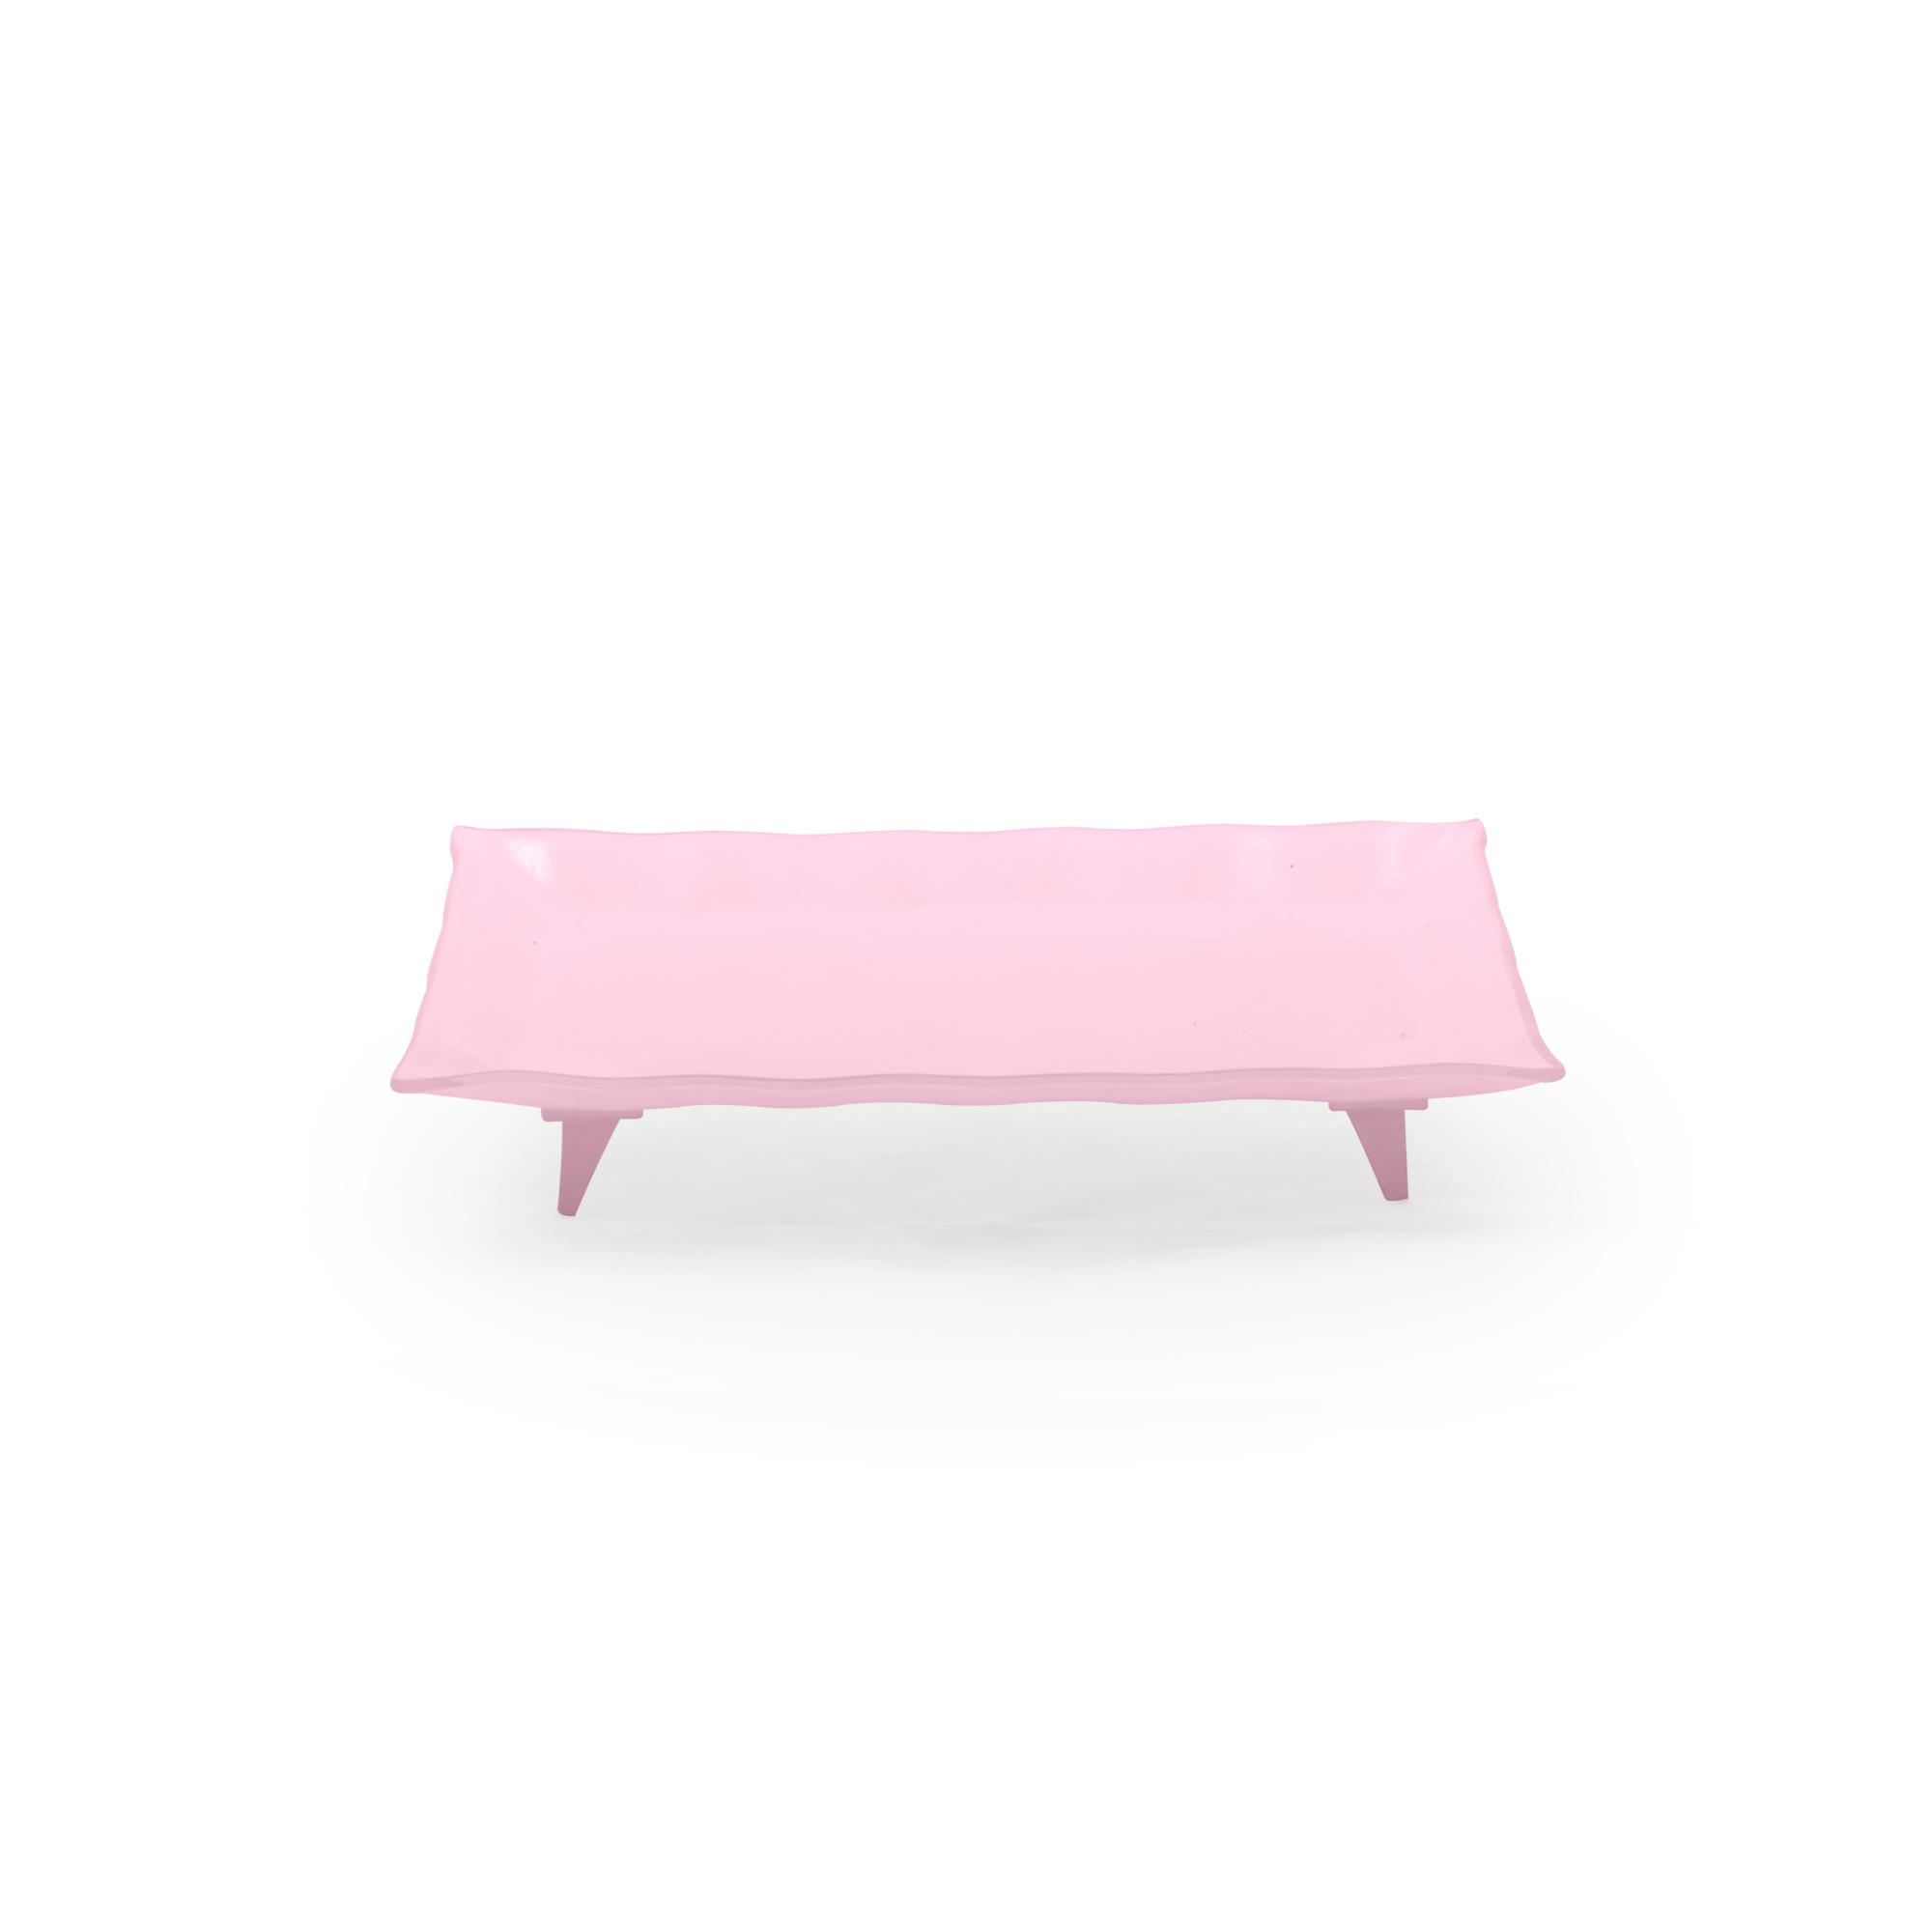 Travessa de vidro retangular pequena rosa